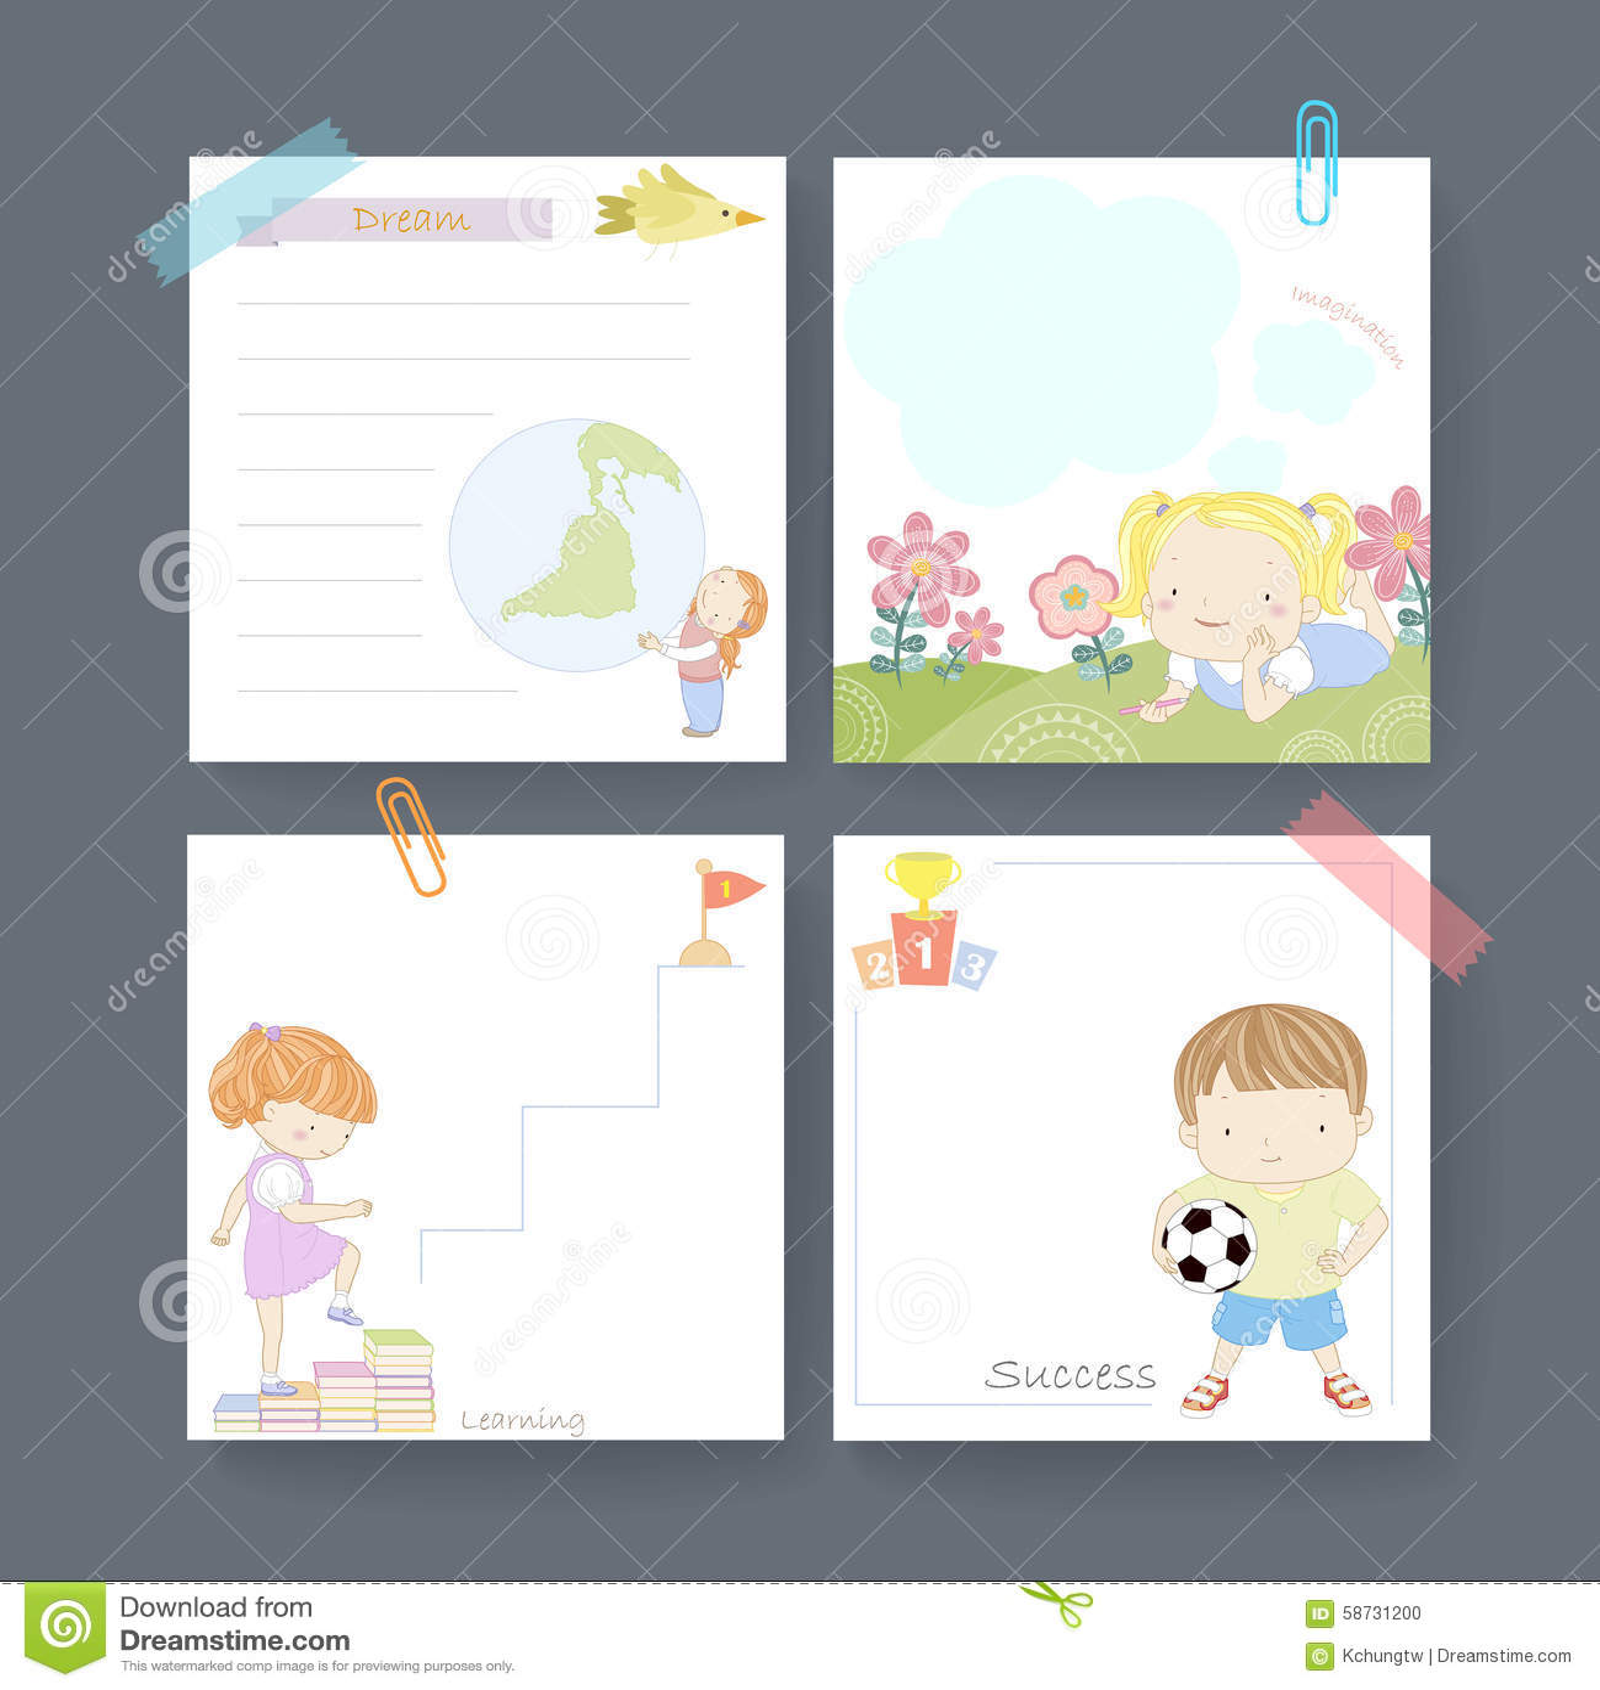 adorable memo paper template design stock vector image  adorable memo paper template design